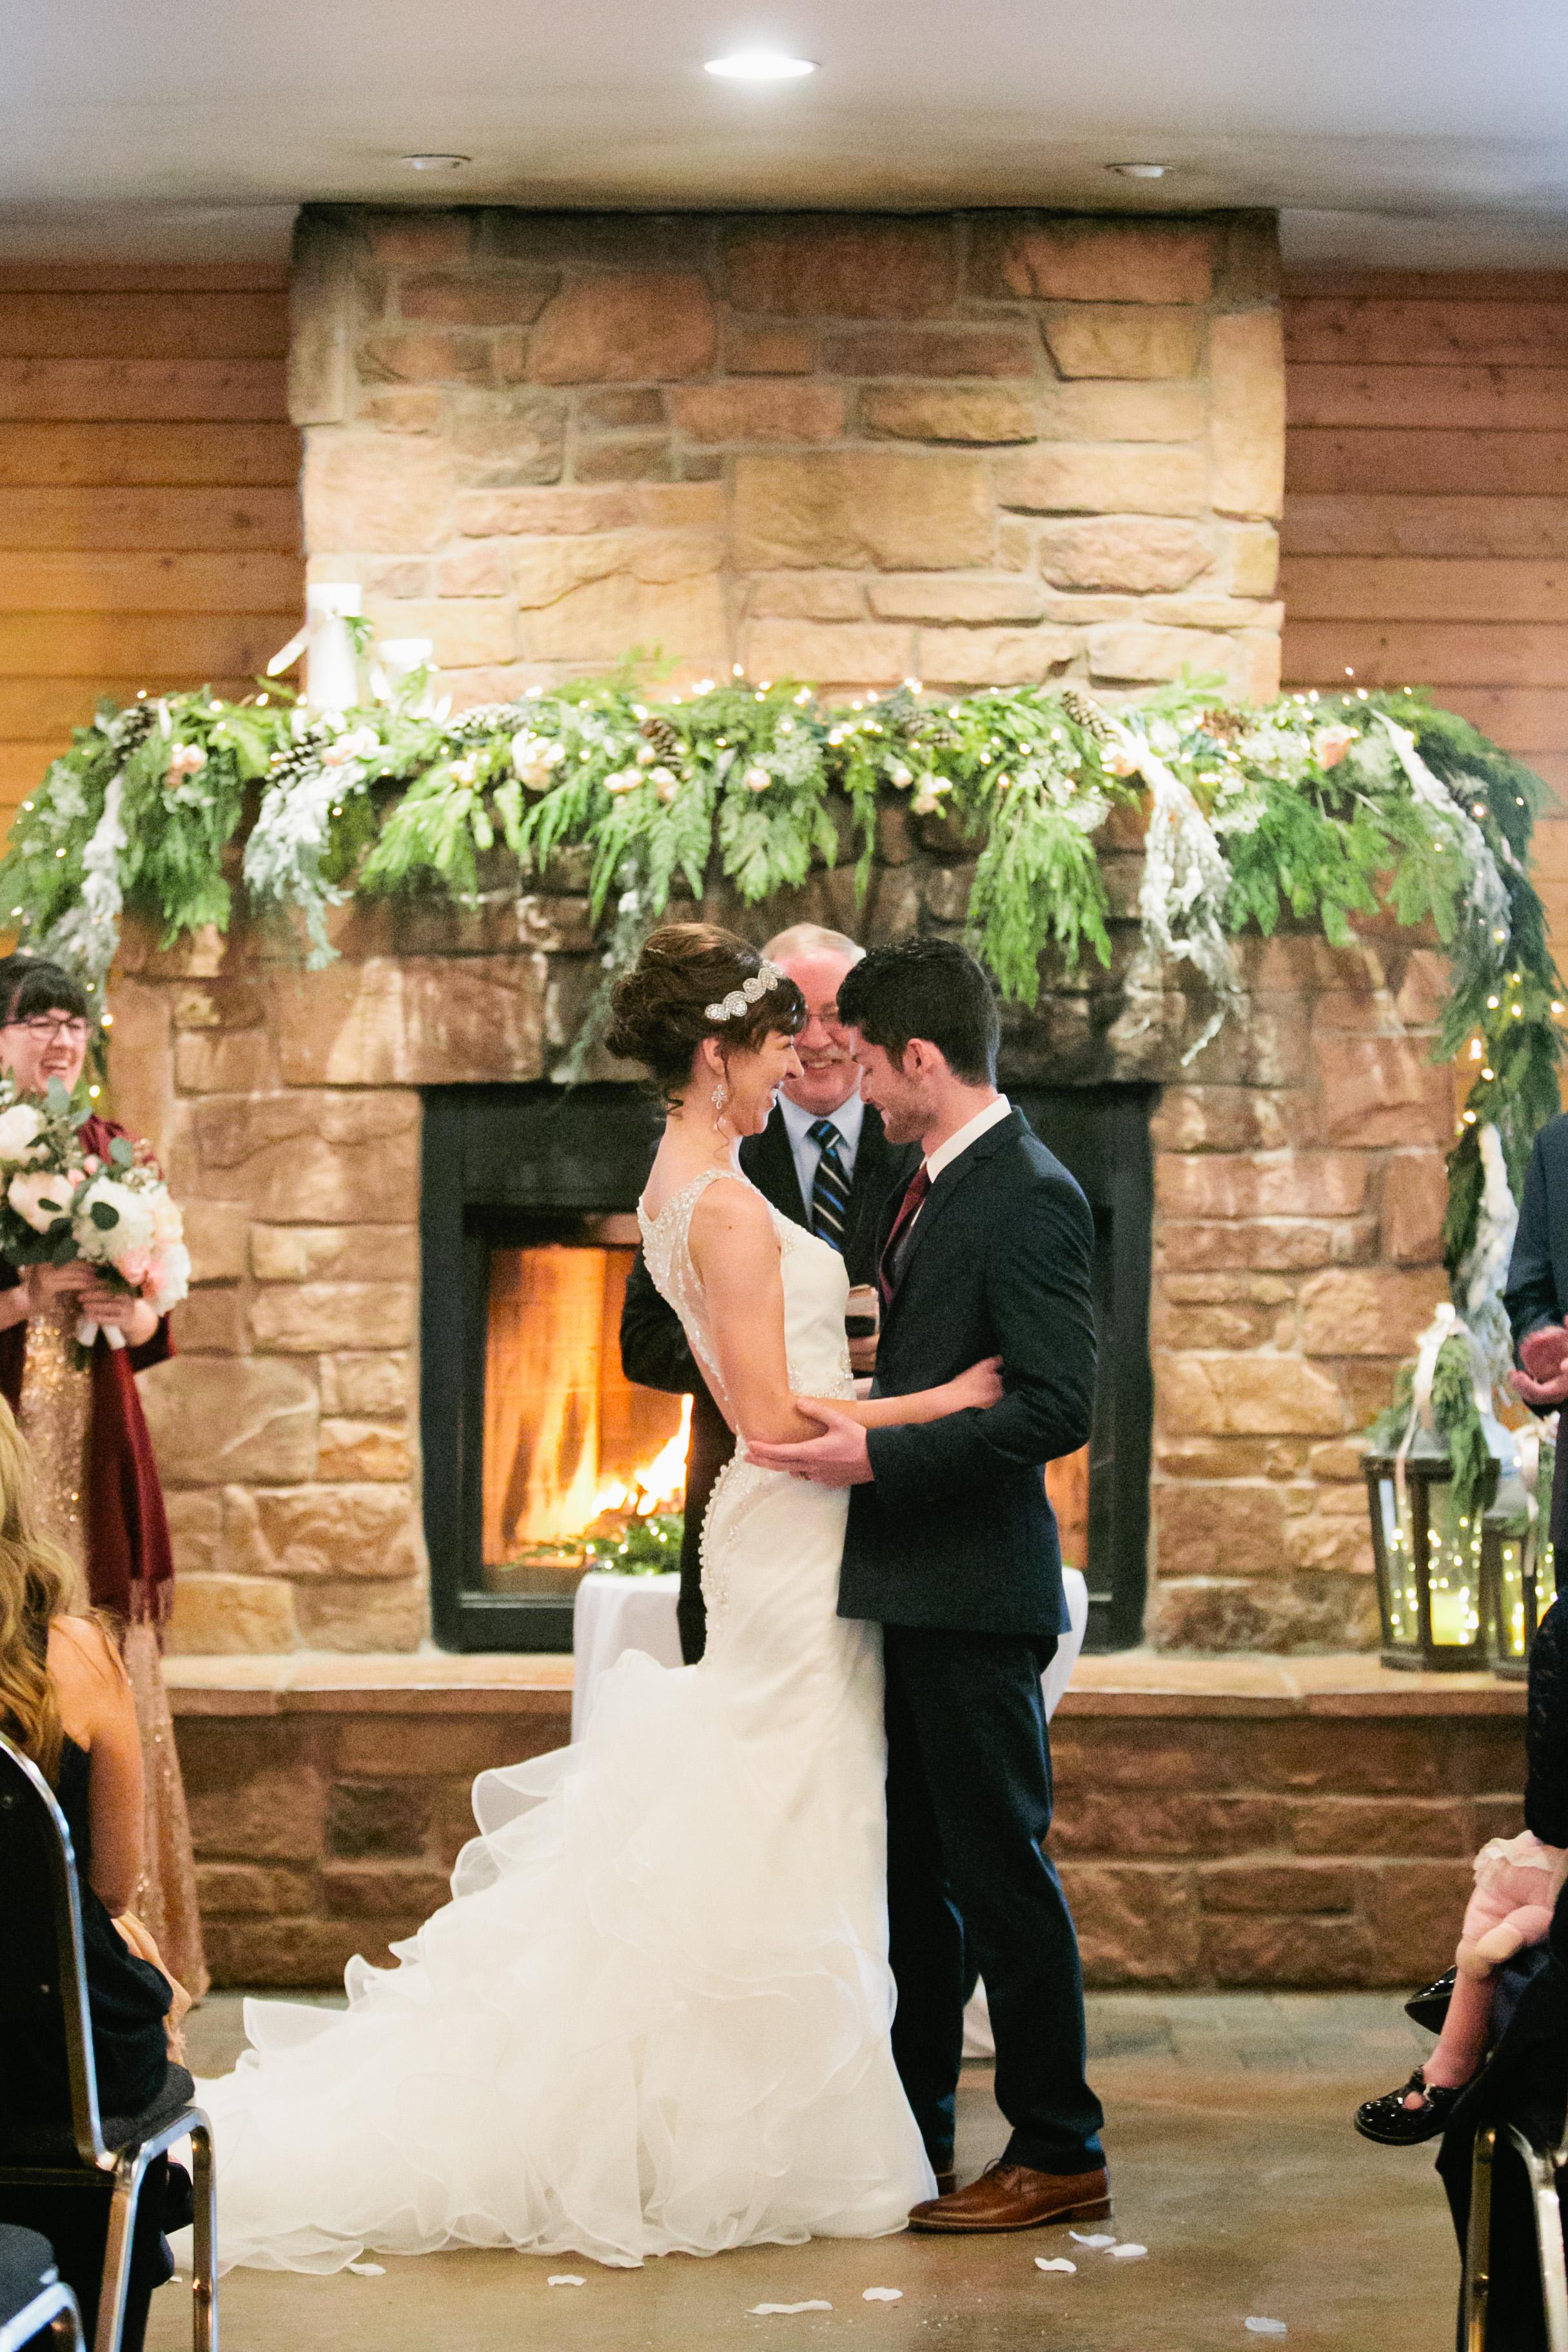 Kisler-wedding-206.jpg